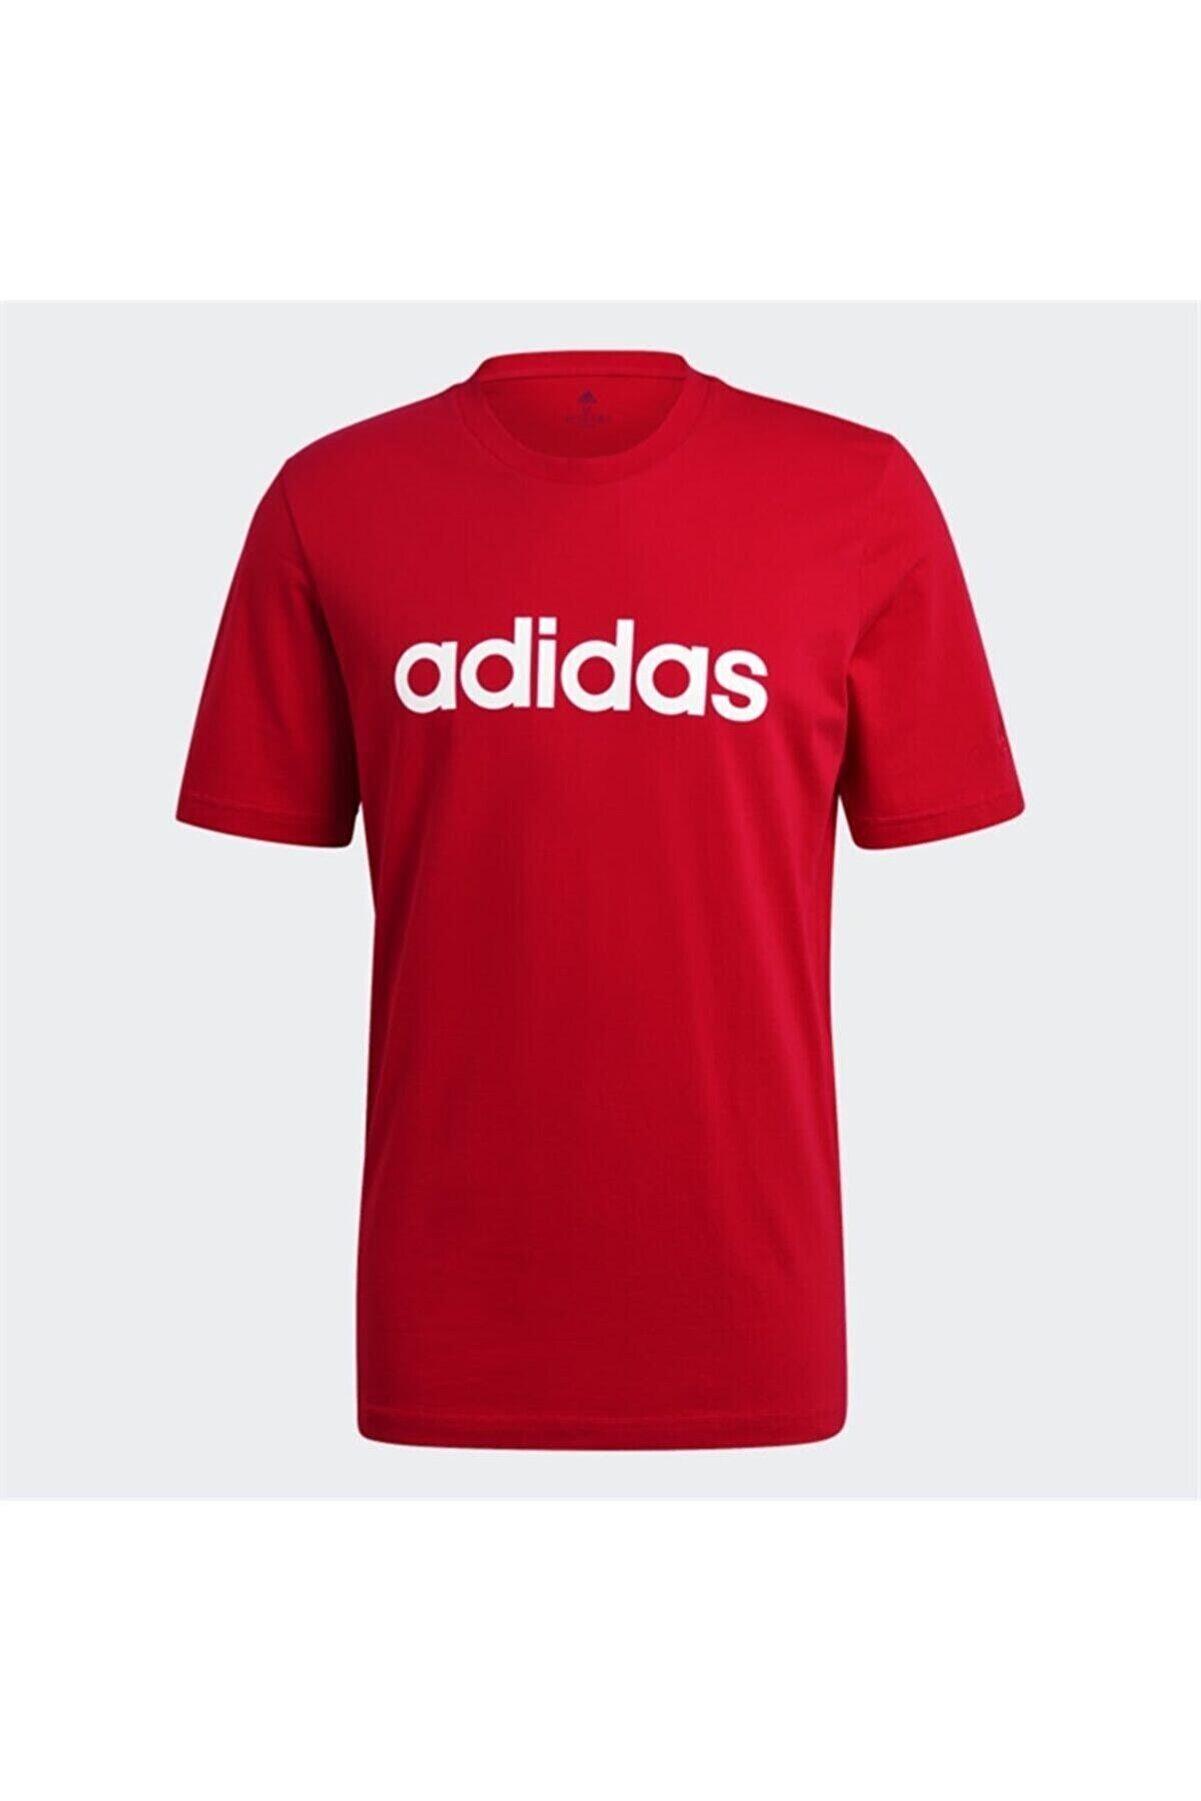 adidas M LIN SJ T Kırmızı Erkek T-Shirt 101079859